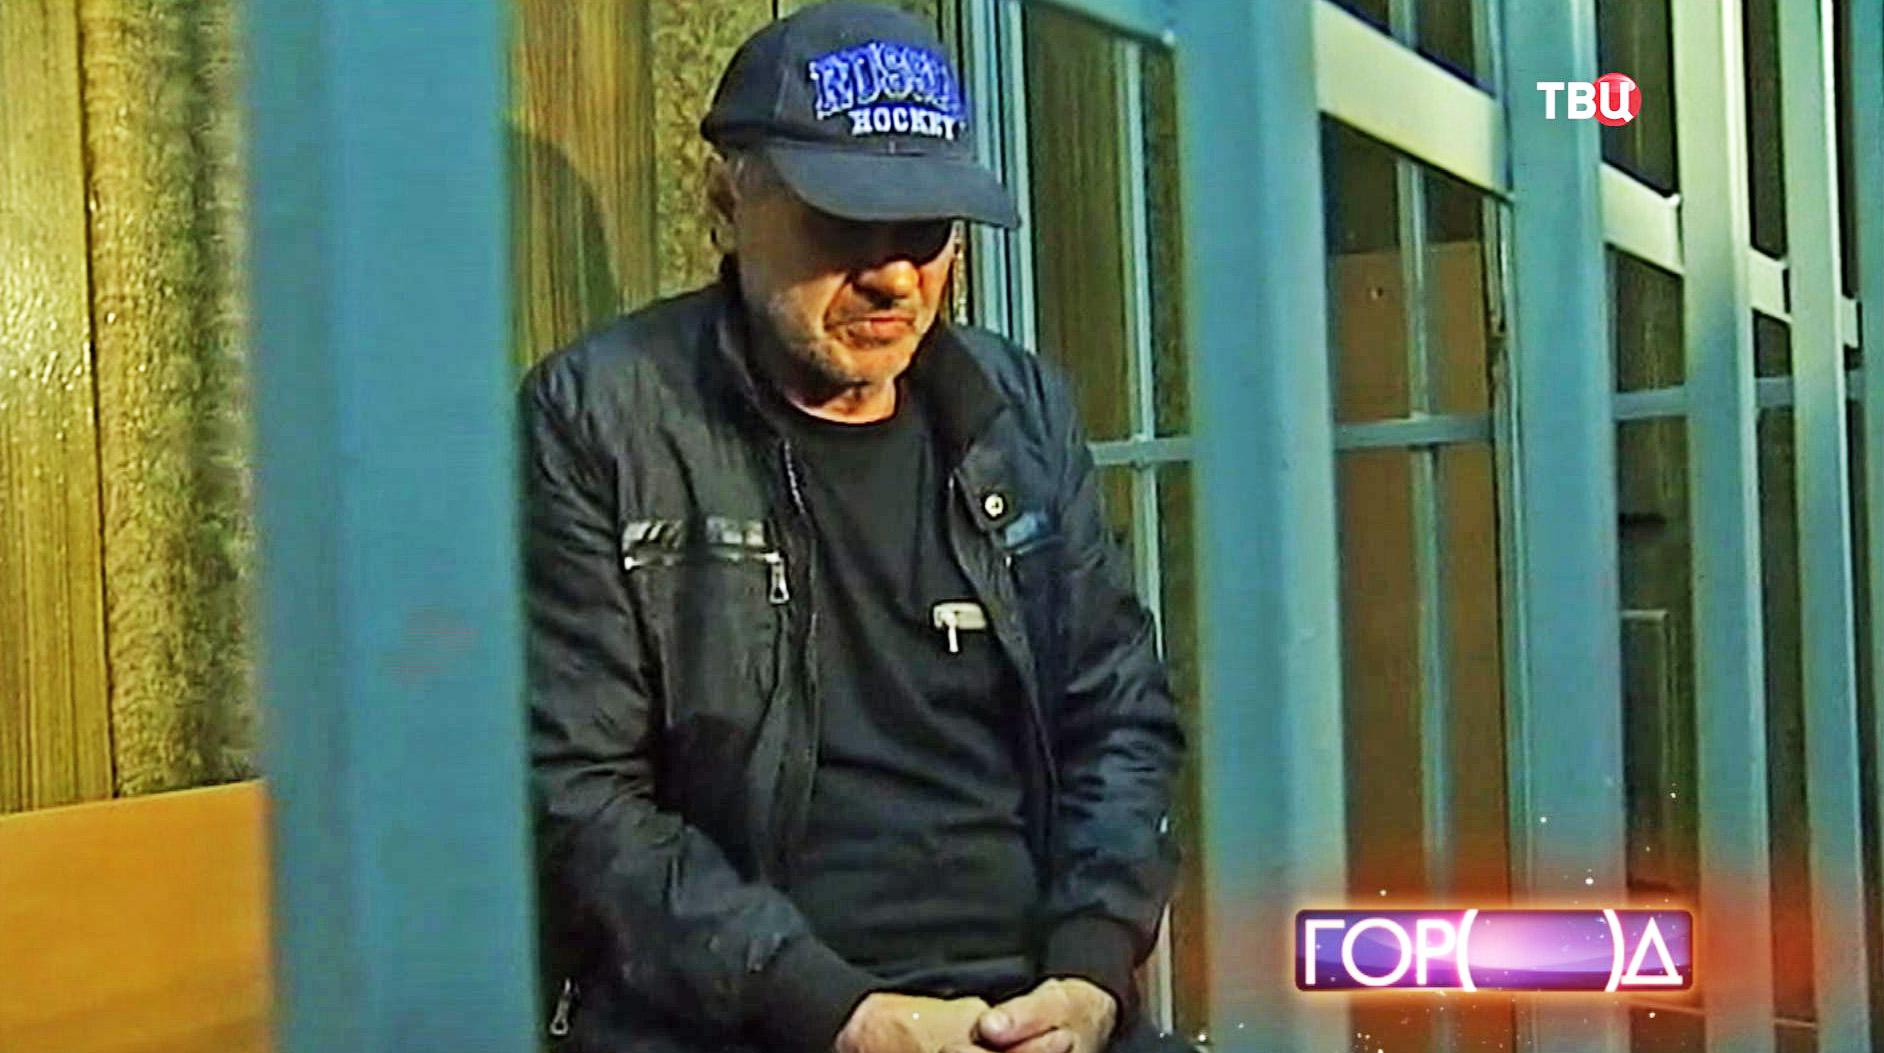 Подозреваемый Валерий Макаренков в зале суда